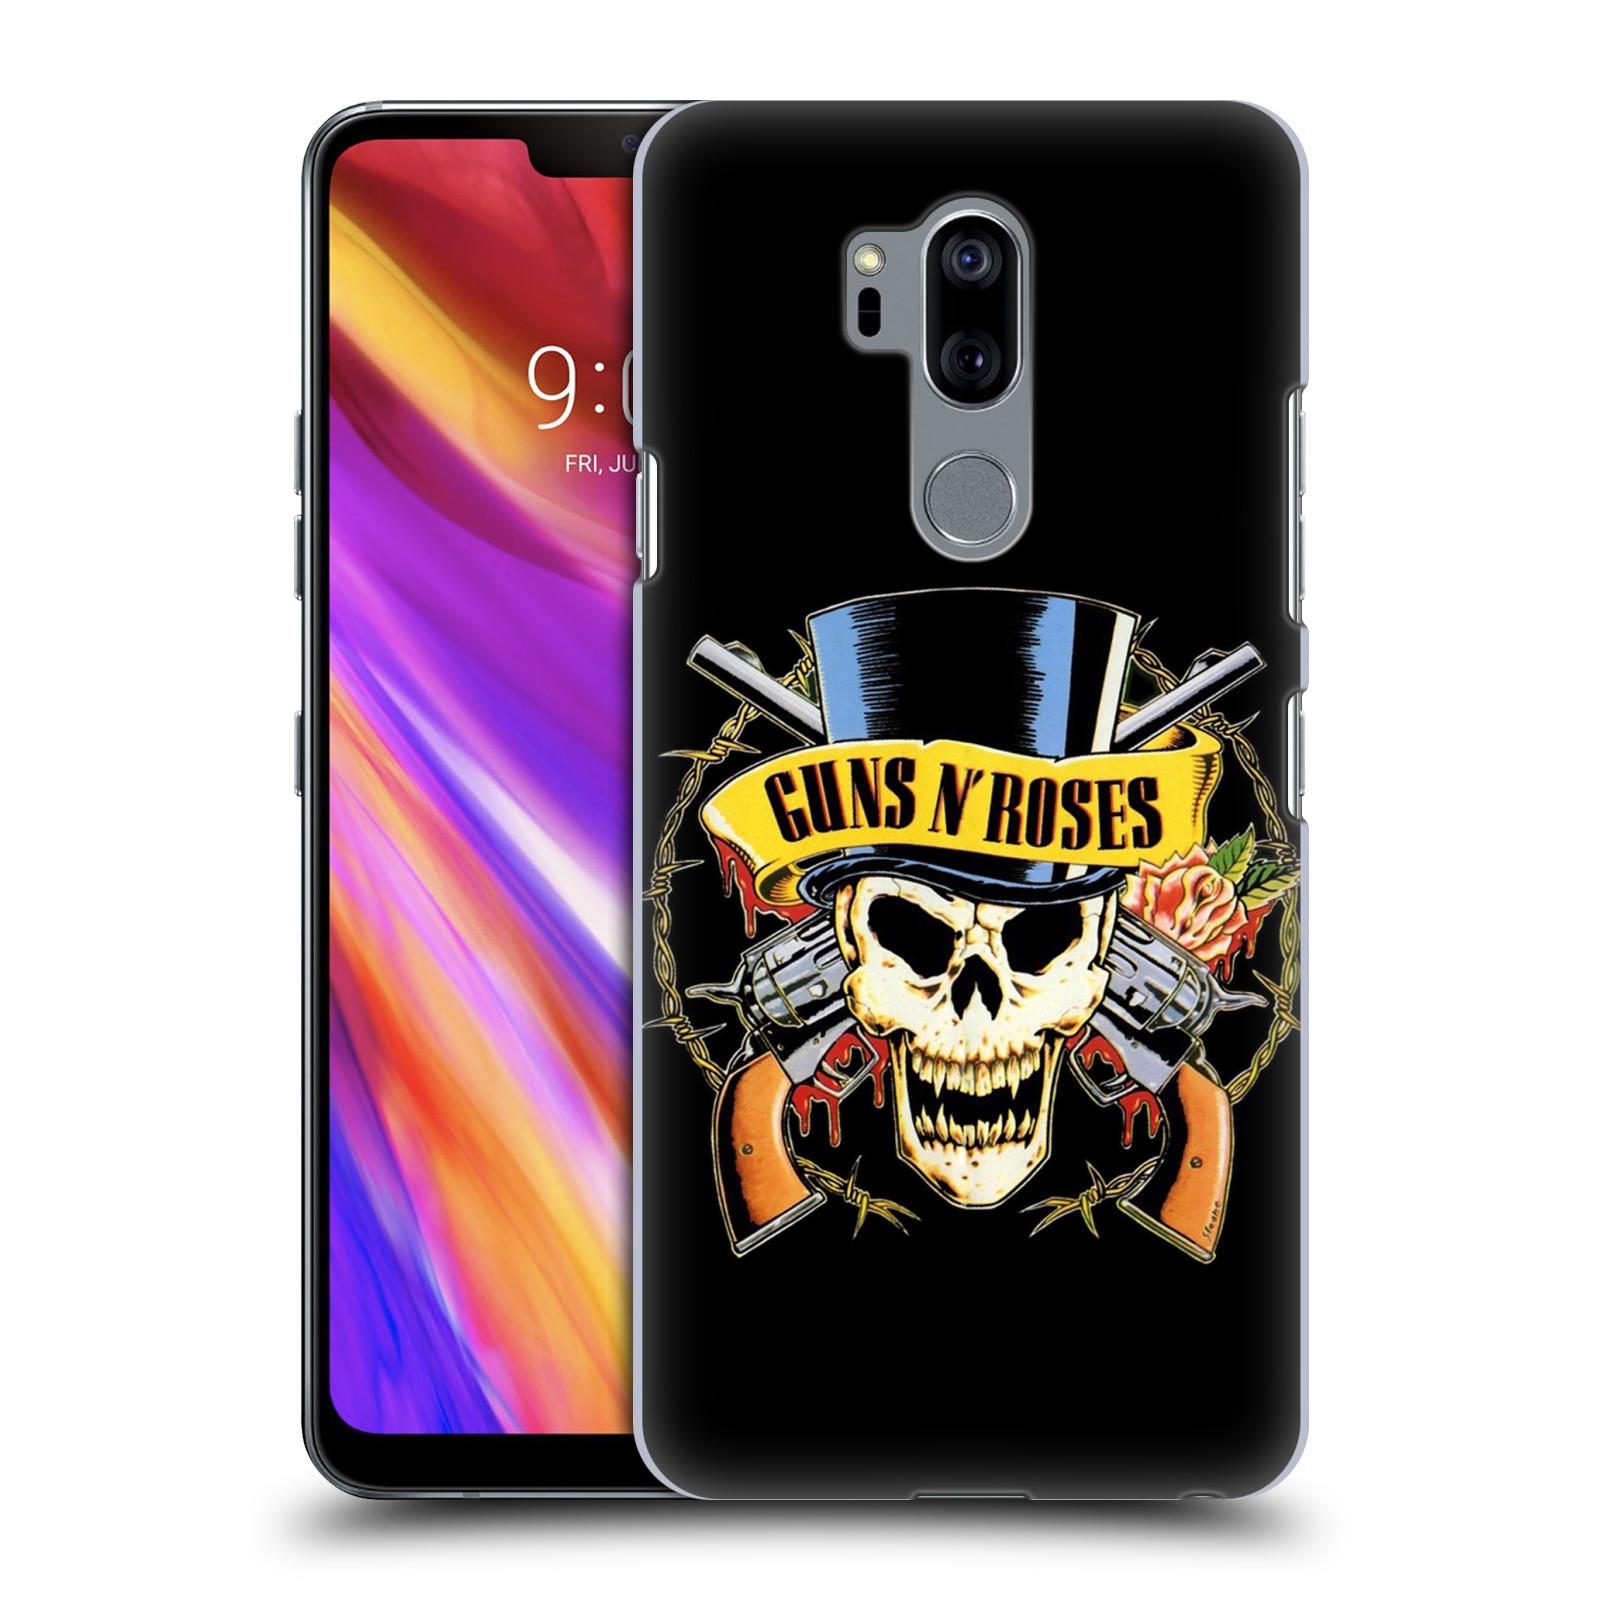 Plastové pouzdro na mobil LG G7 ThinQ - Head Case - Guns N' Roses - Lebka